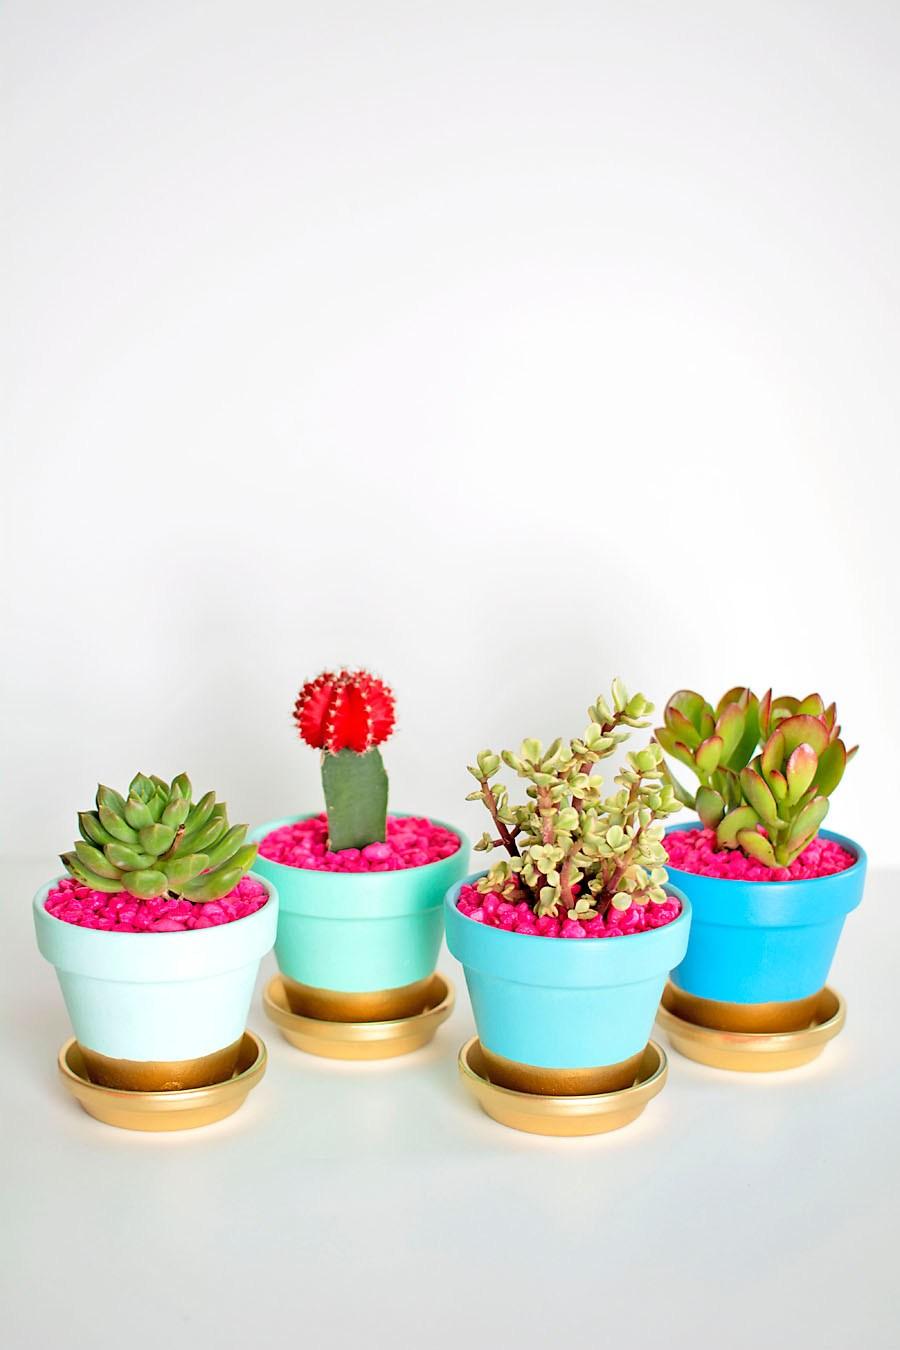 DIY-Gold-Dipped-Plant-Pots